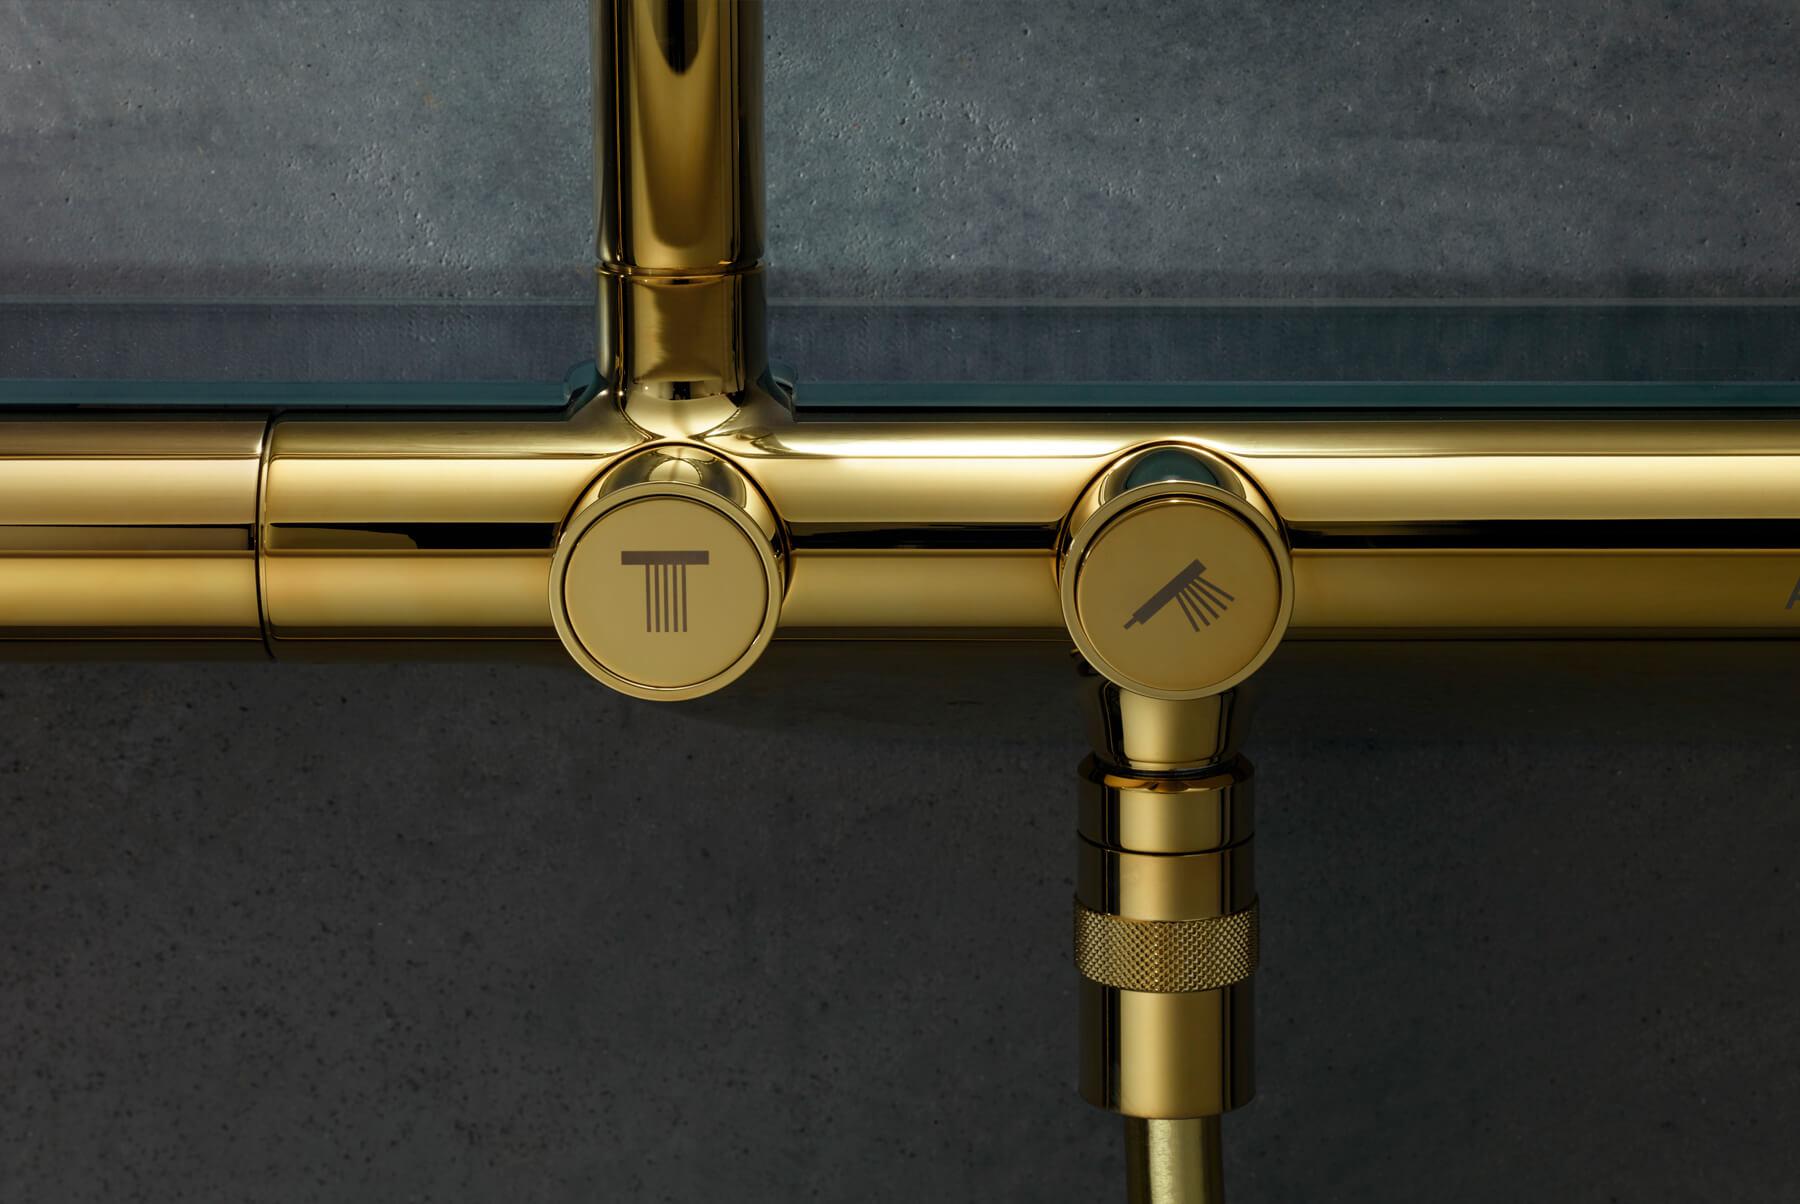 Brassware-AXOR-SHOWER-SOLUTIONS-INSET-10-1800x1204